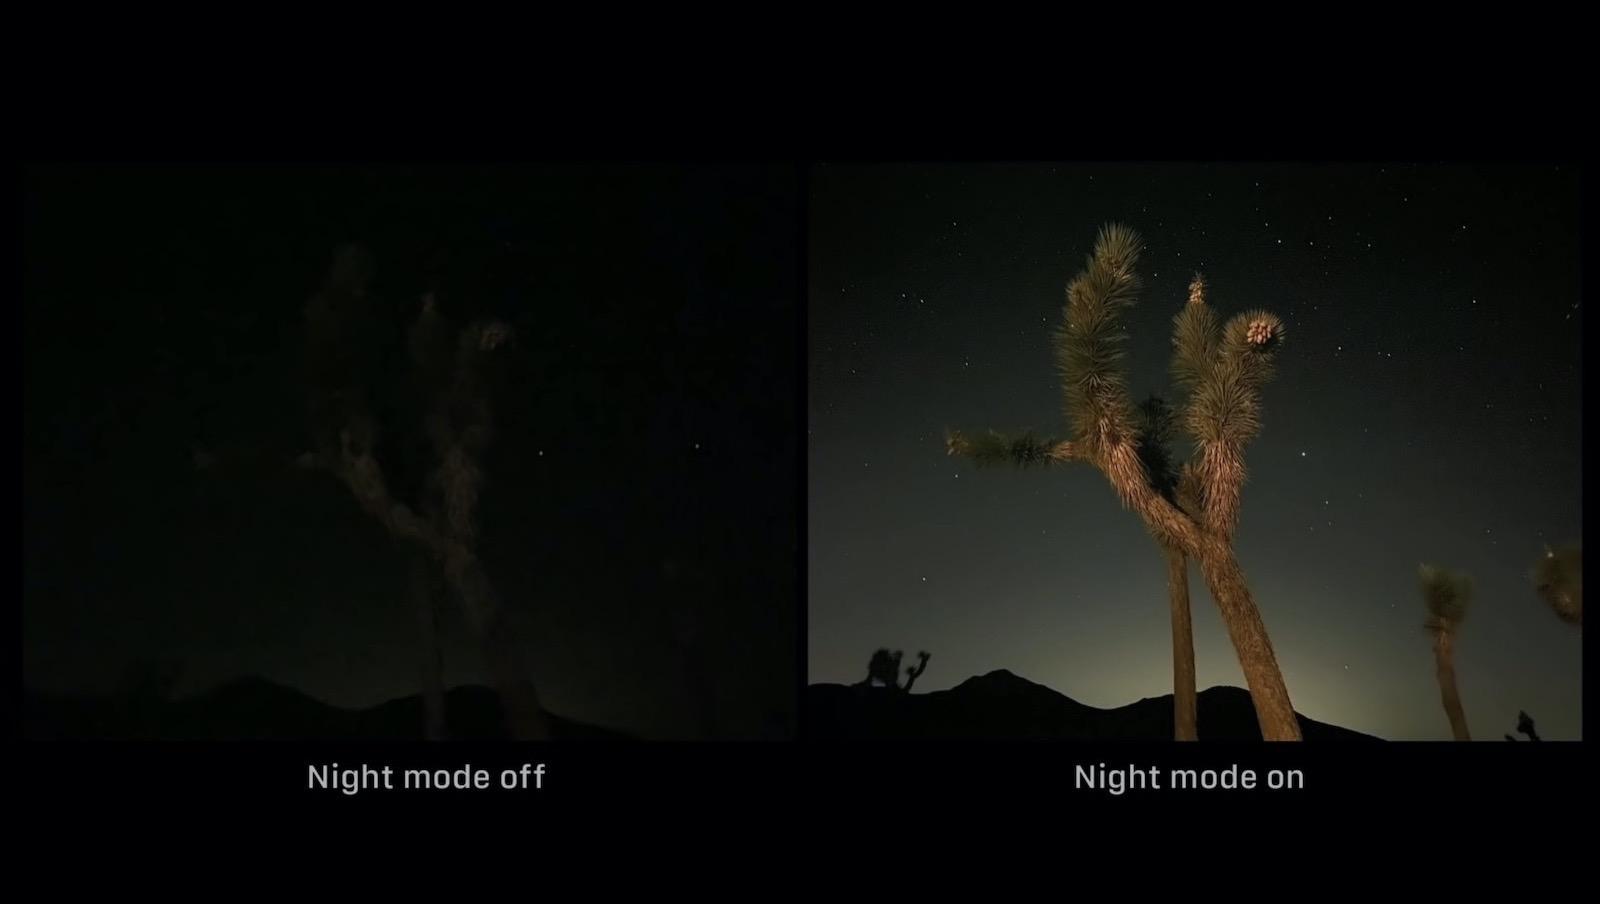 night-mode-for-iphone-11-tvcm.jpg